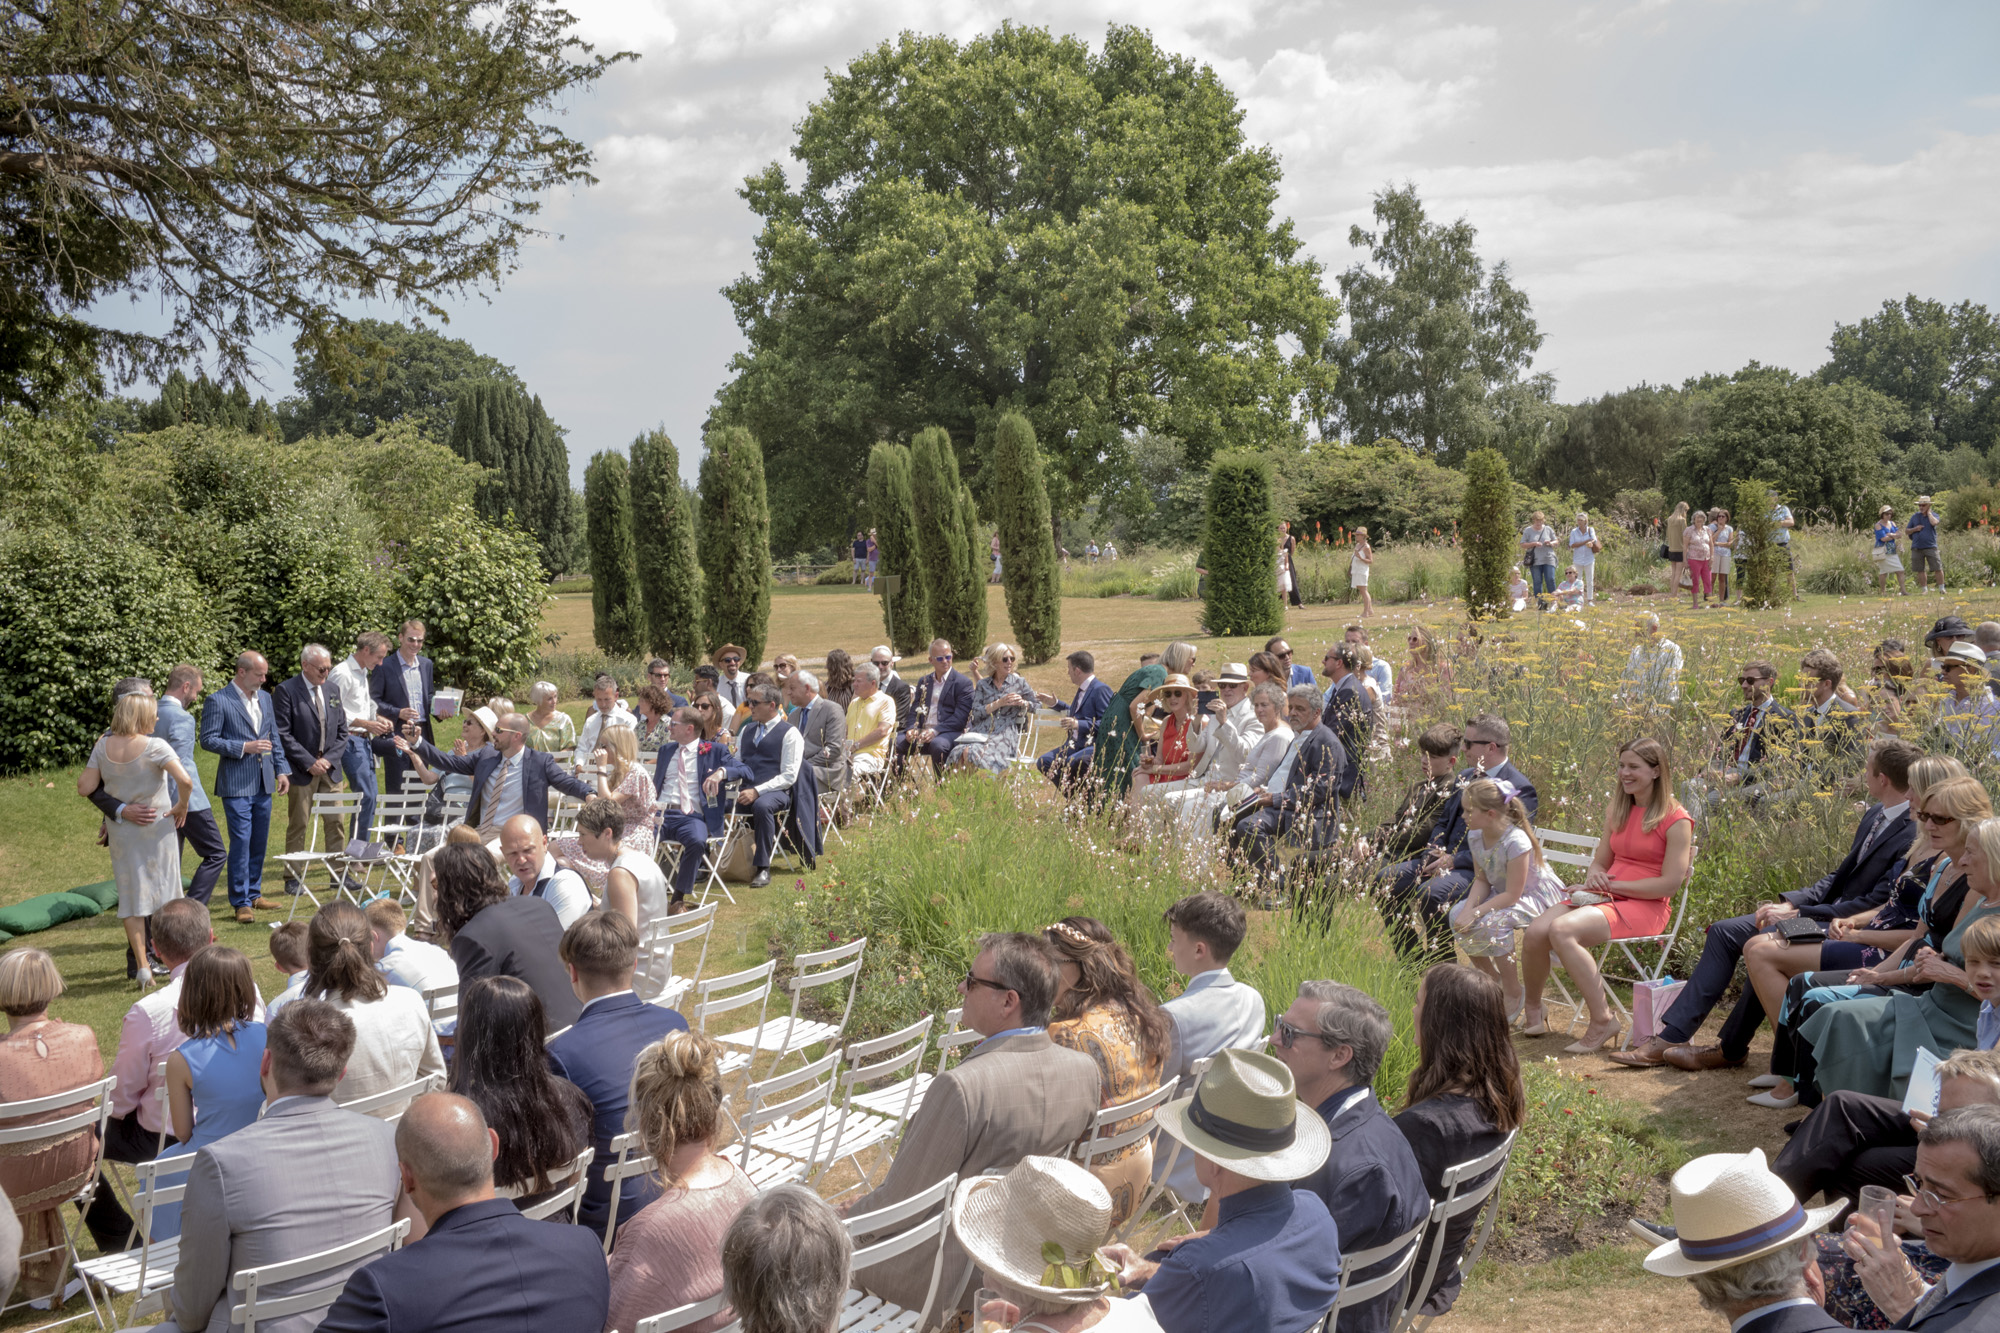 Jaz-Kate-Beaumont-Oyster-Silk-Bias-Cut-Wedding-Gown-Larkspur-Lace-Top-Sussex-Wedding-2.jpg